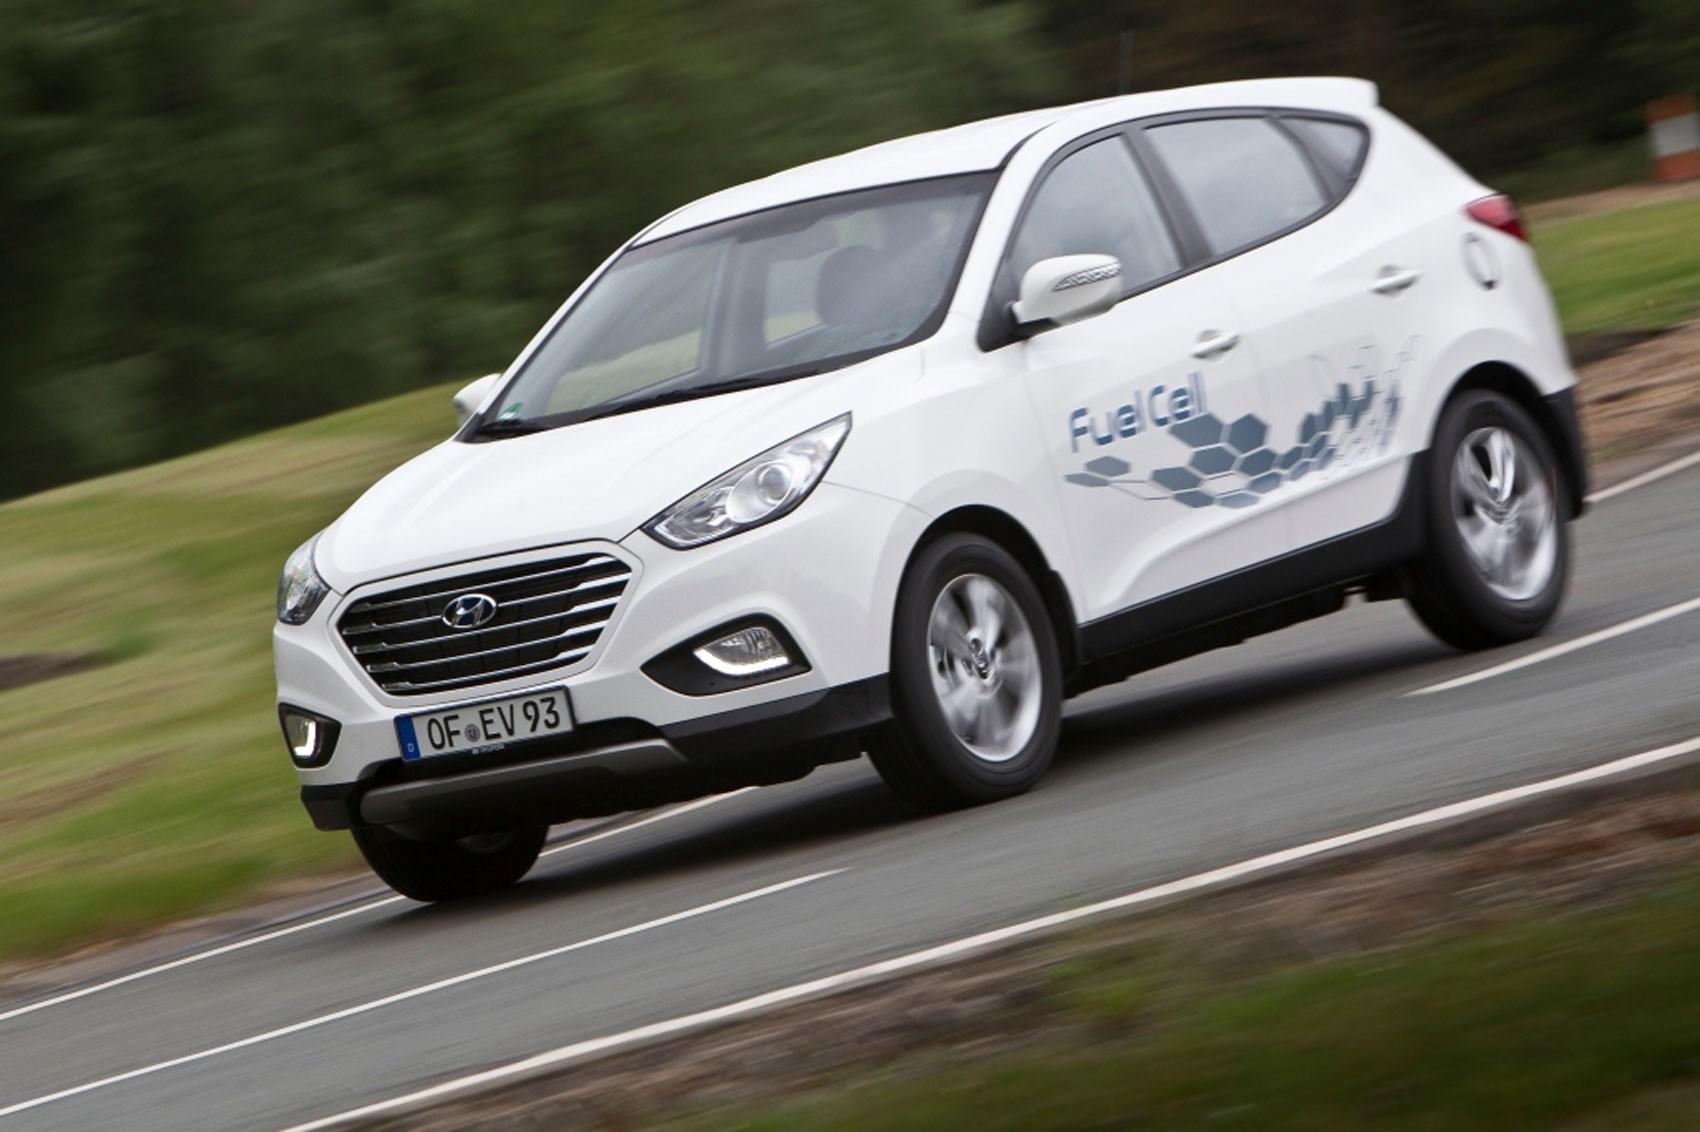 Hydrogen Powered Hyundai Ix35 Fuel Cell Costs 53 000 Car Magazine